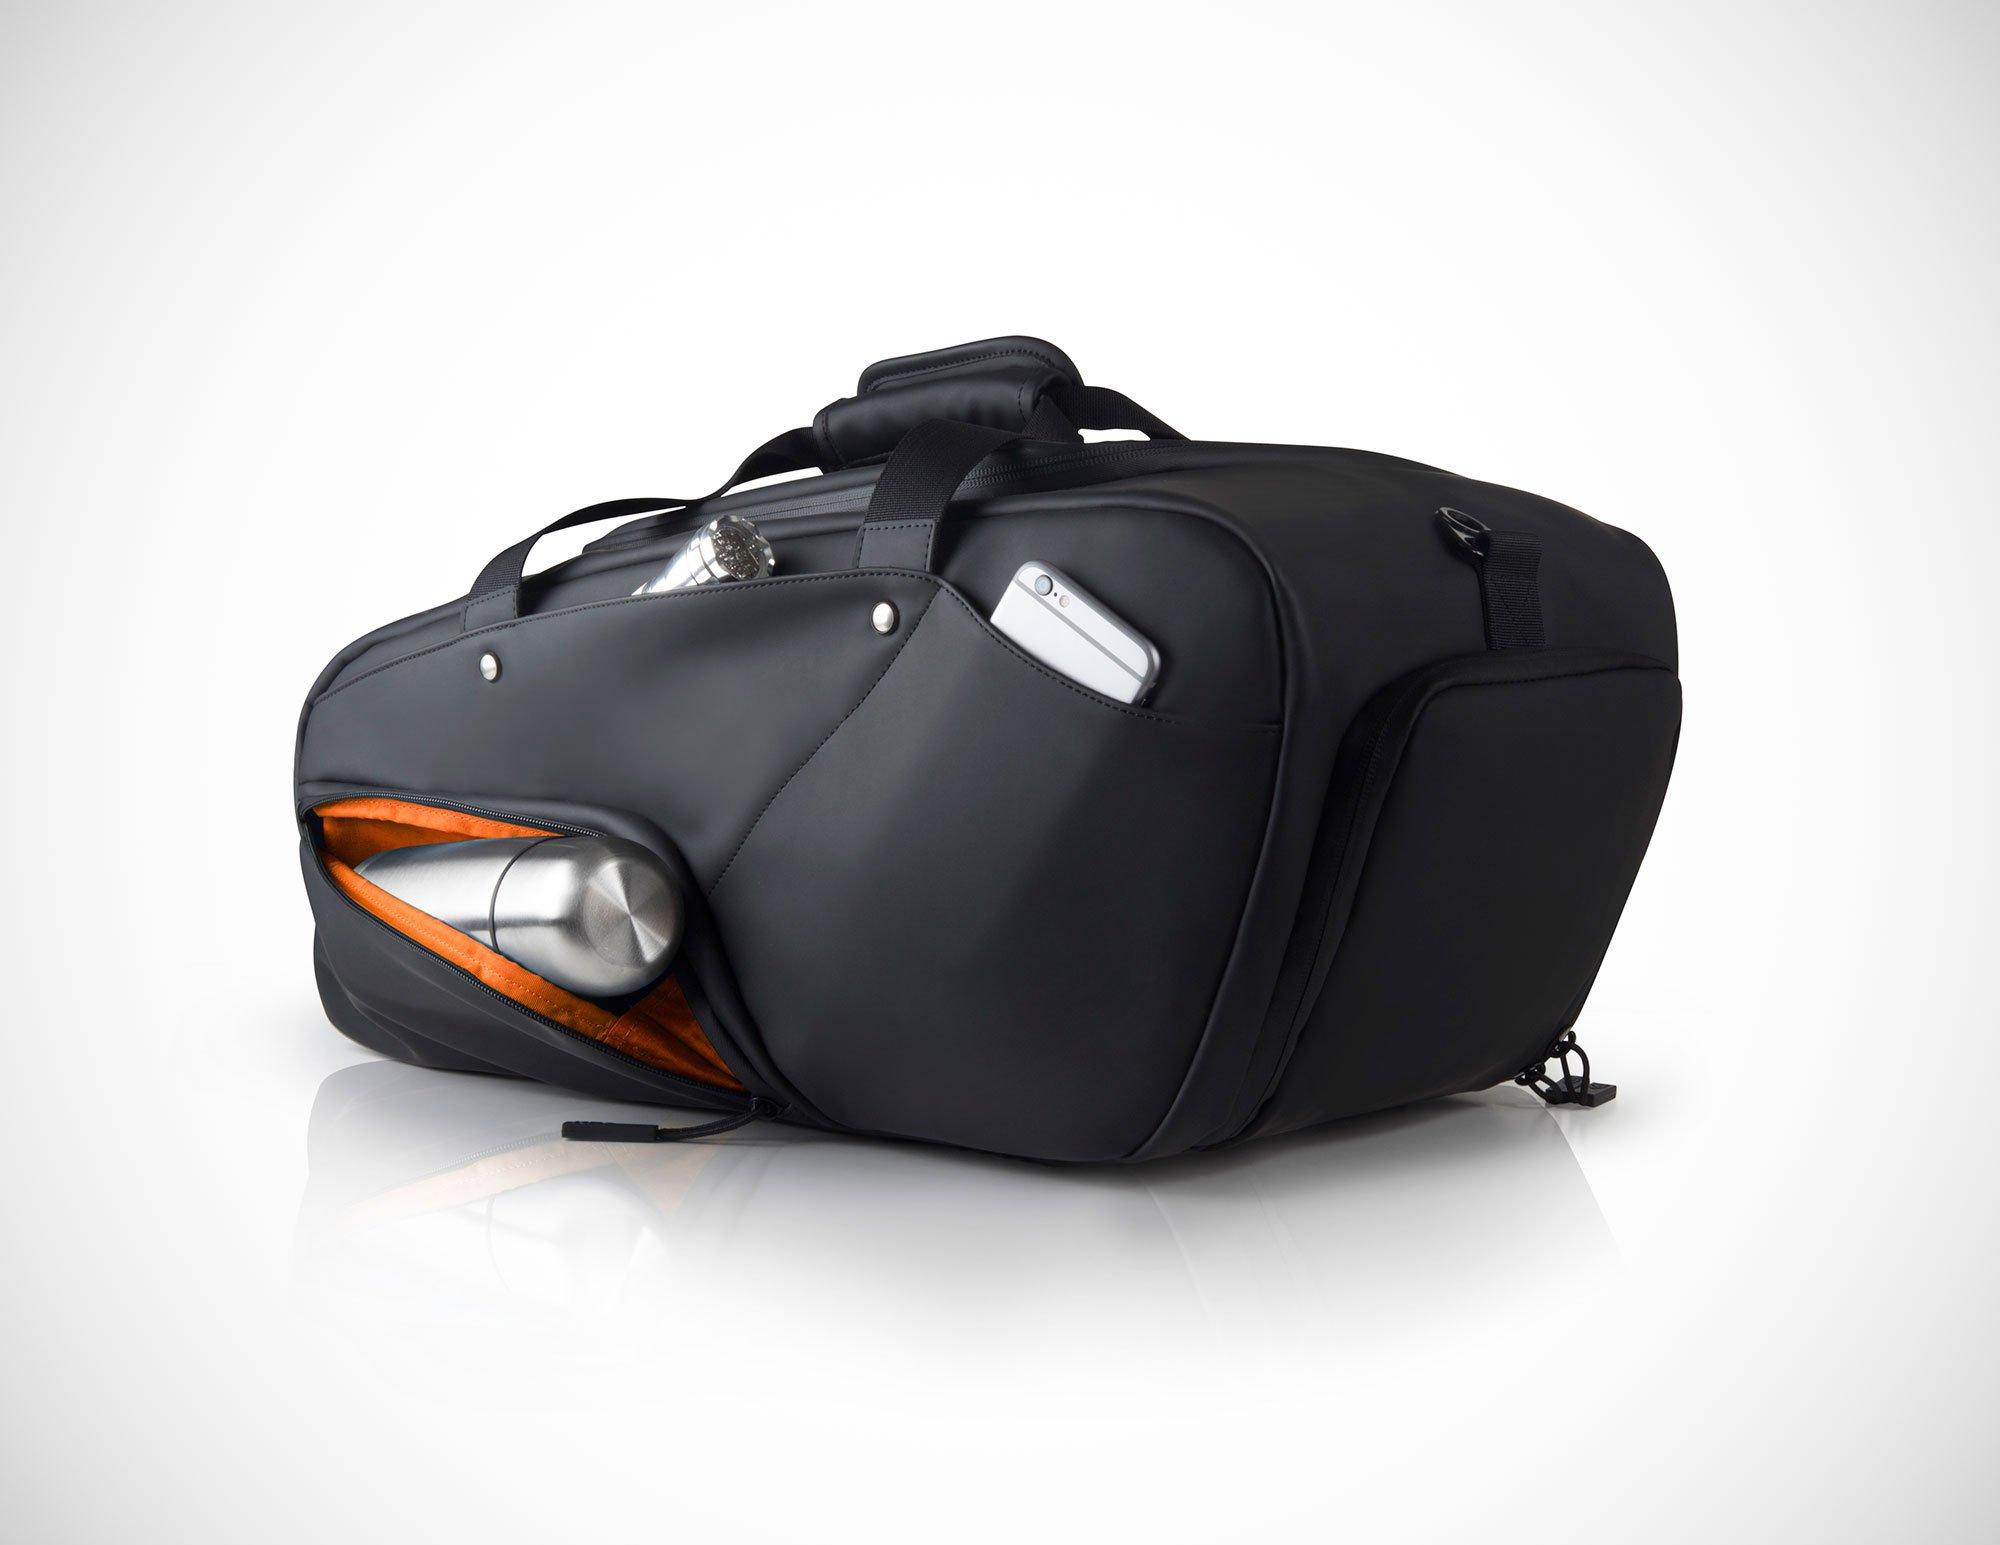 e9c5e2cf05 The KP Duffle Bag